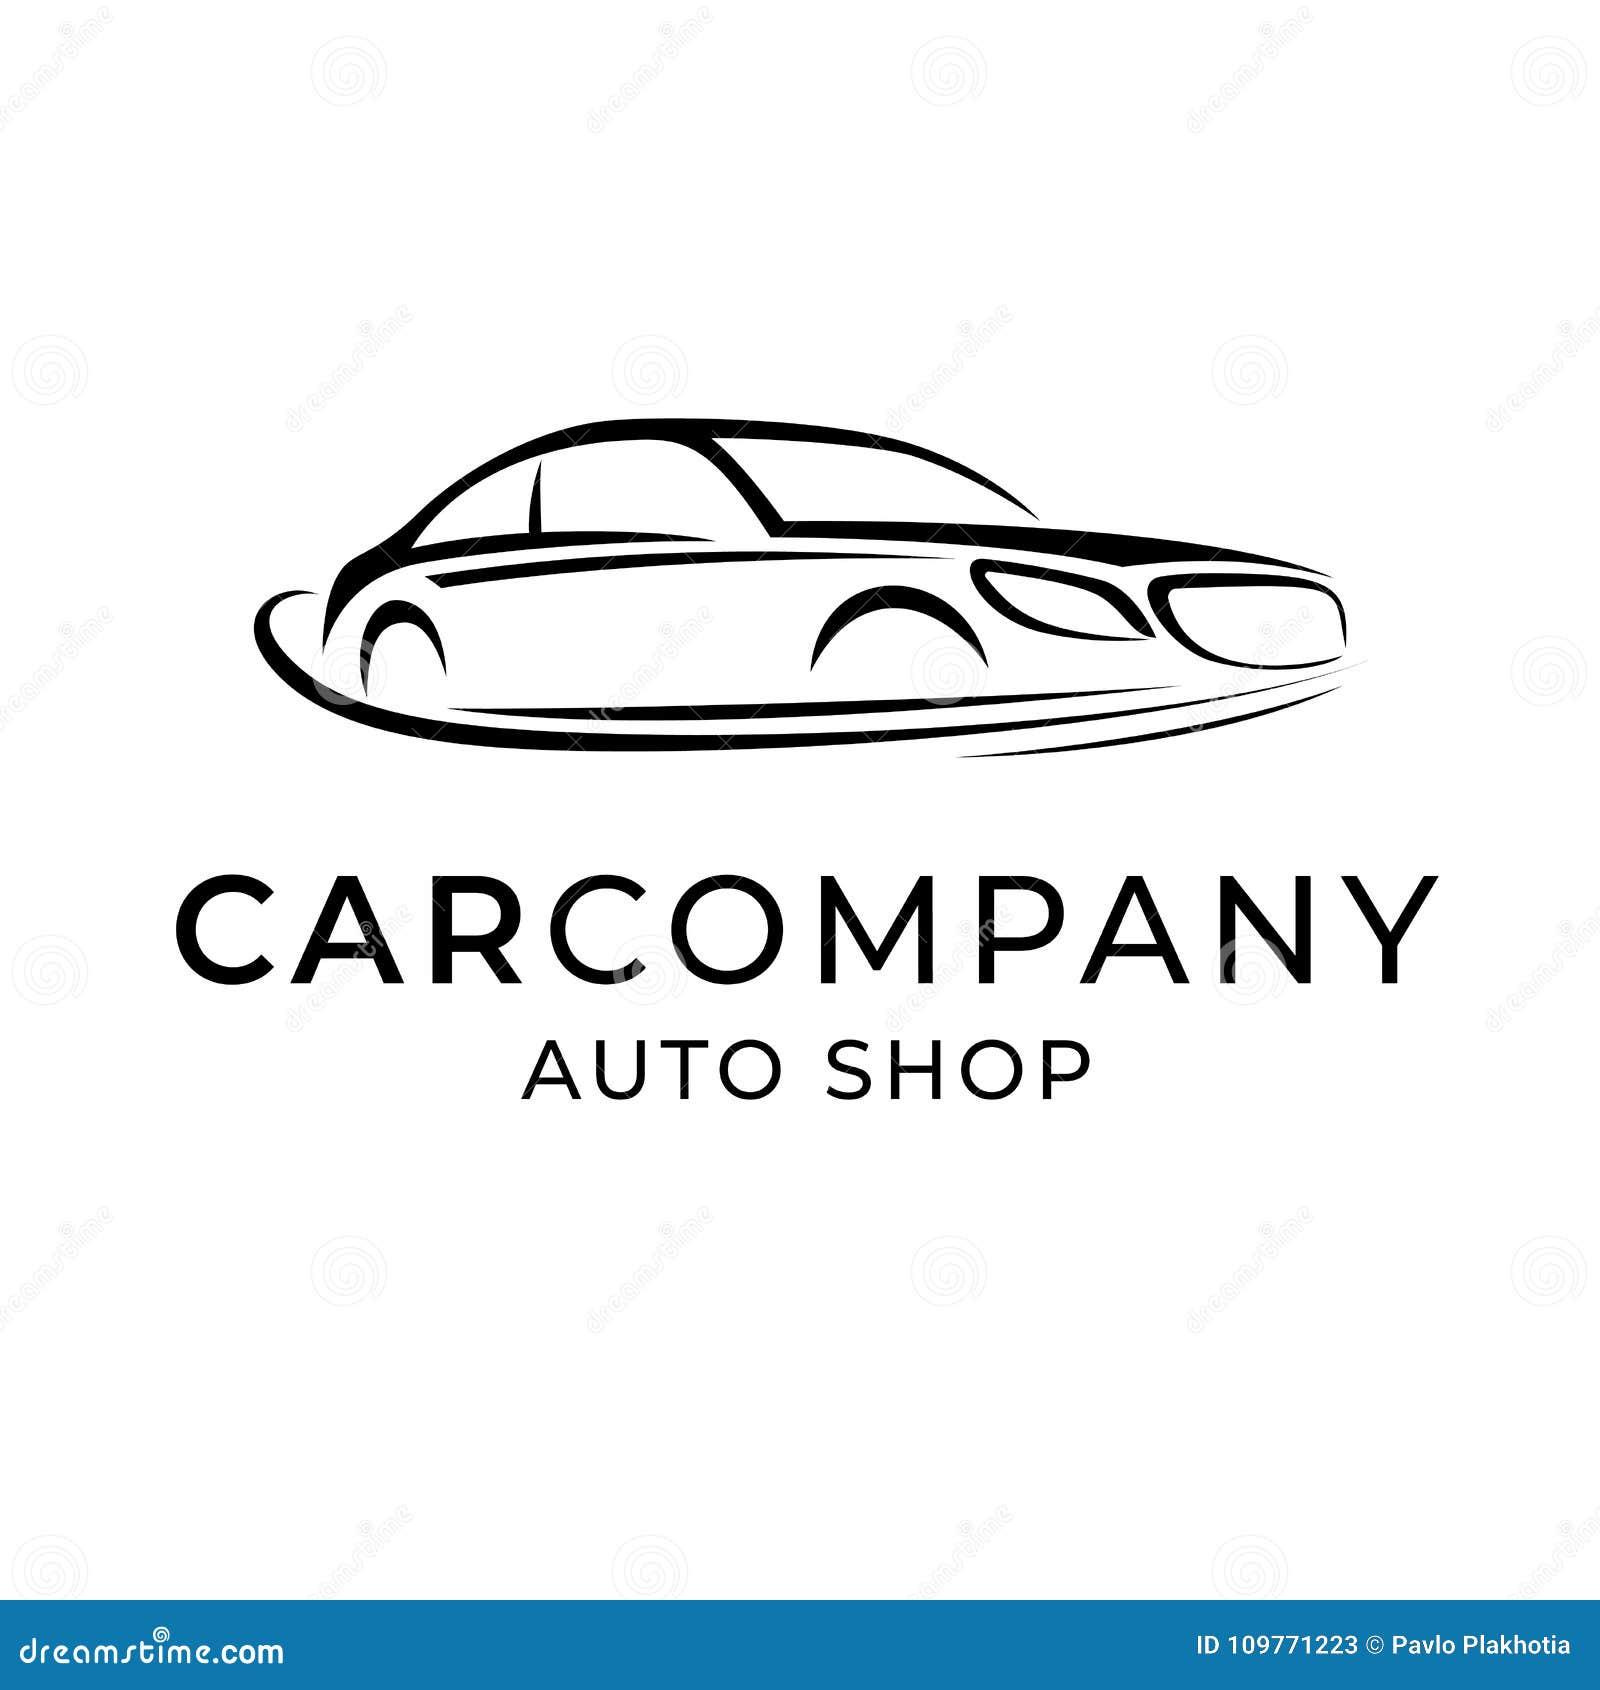 Auto Dealer Shop Template Emblem Creative Logo Design For Car